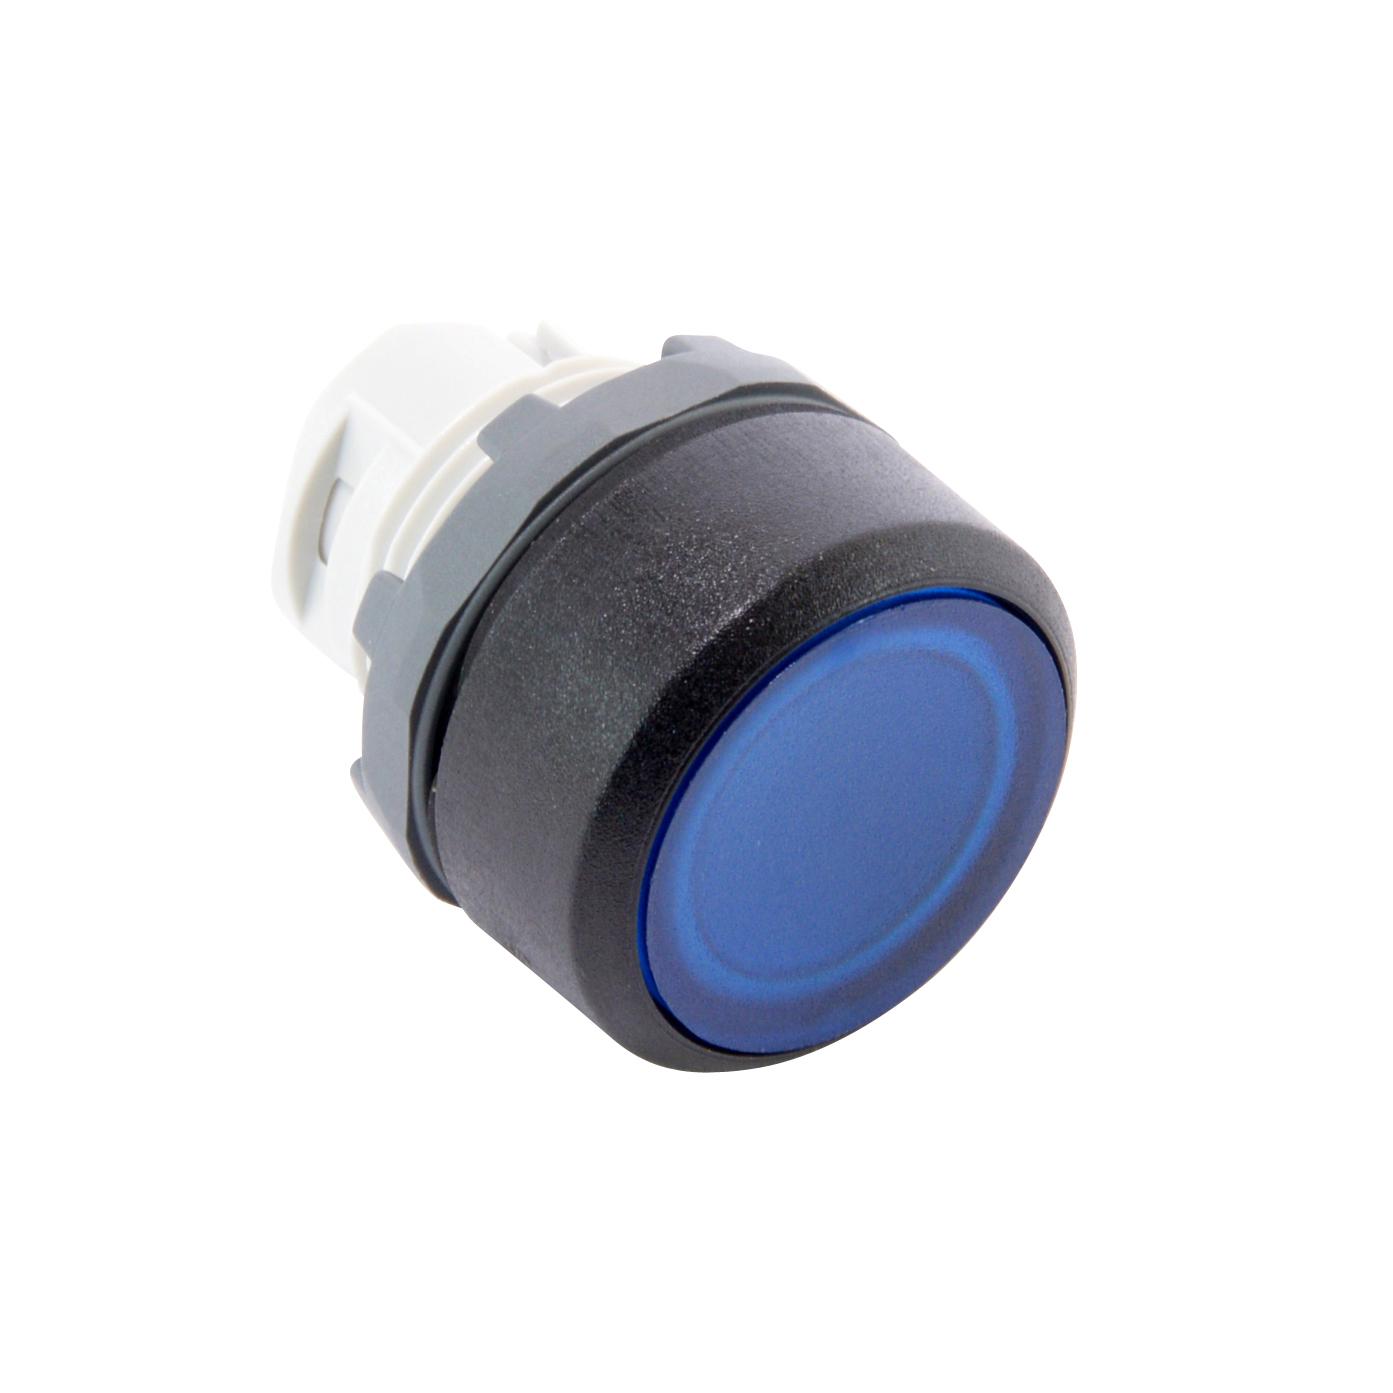 ABB MP1-11L Illuminated Pushbutton